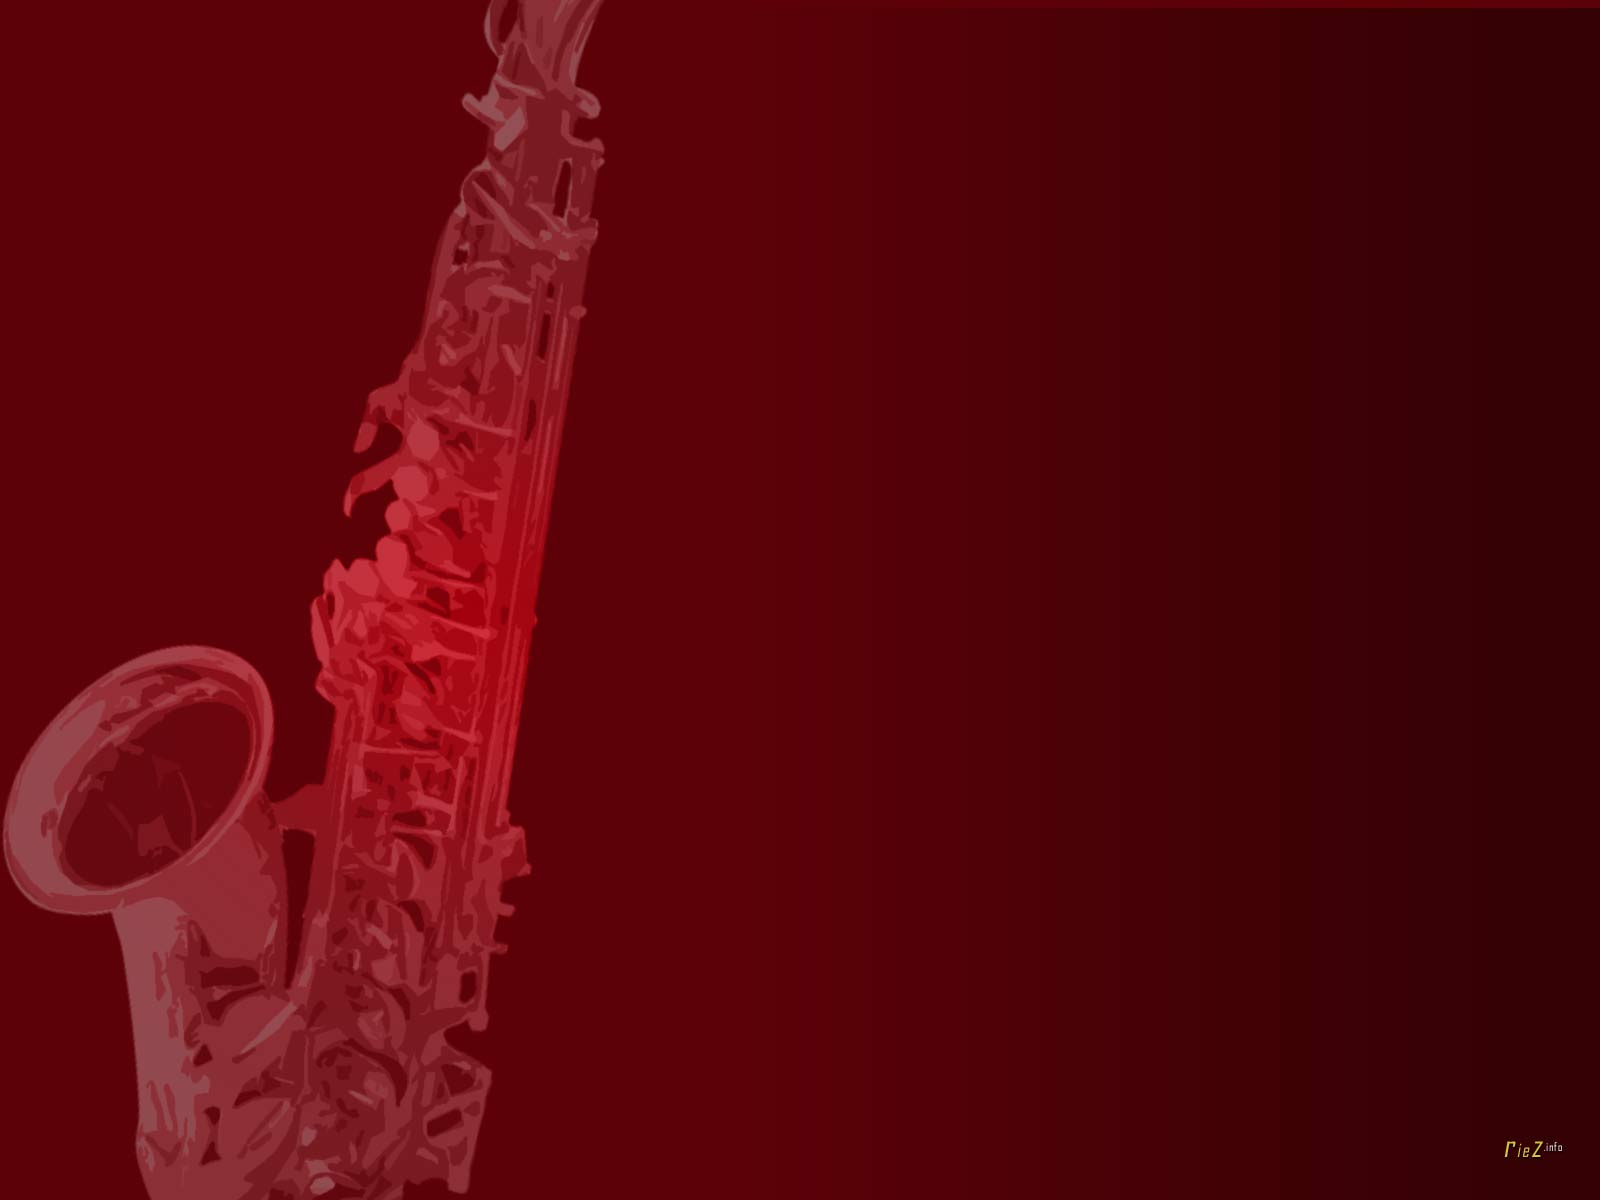 100 music backgrounds for powerpoint powerpoint template music backgrounds for powerpoint jazz music wallpaper wallpapersafari toneelgroepblik Images